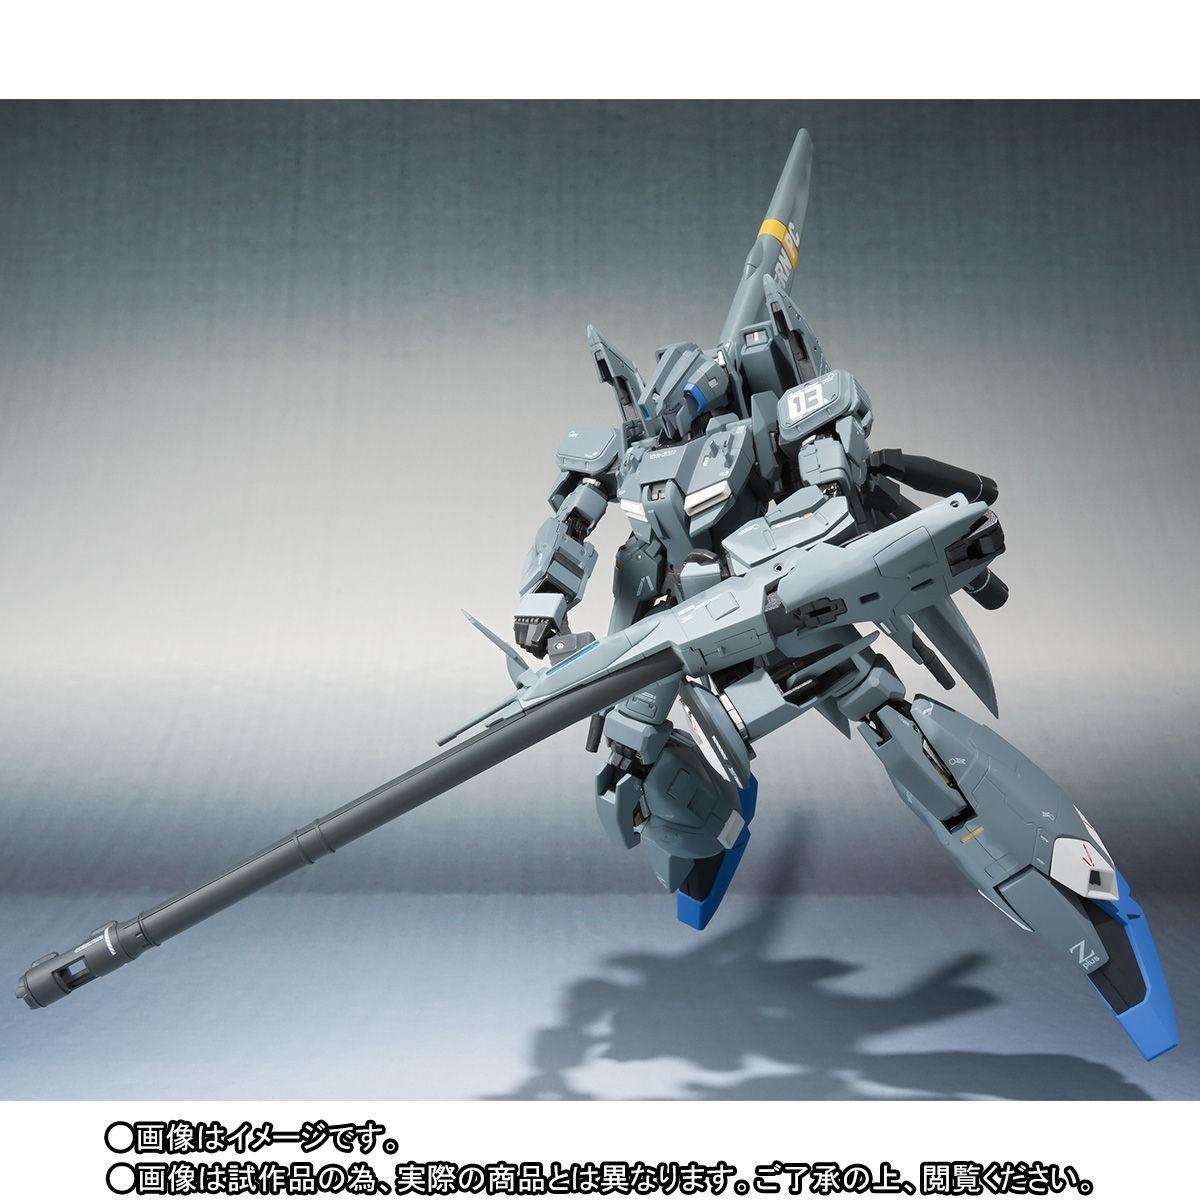 METAL ROBOT魂(Ka signature)<SIDE MS>『ゼータプラス C1(03 シグマン機)』可動フィギュア-002